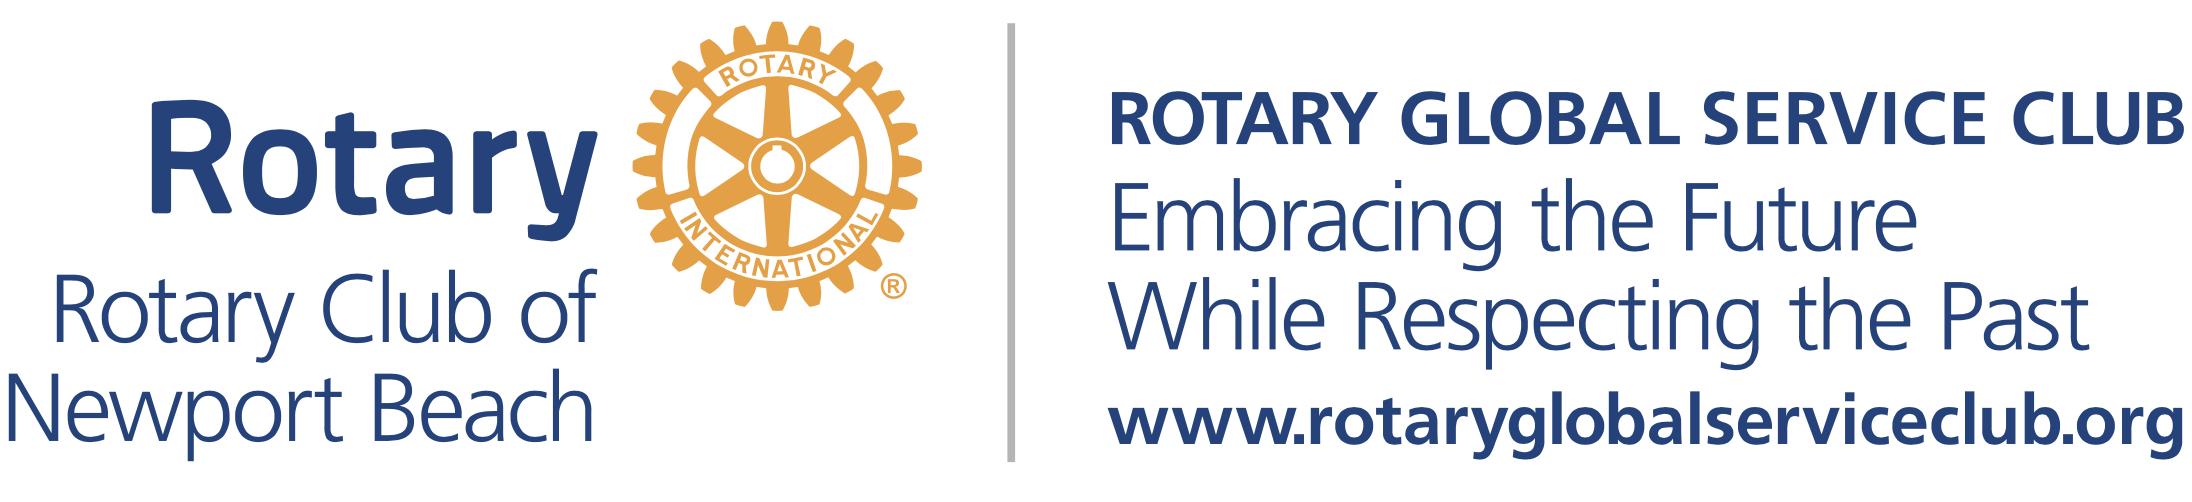 Rotary Global Service Club Logo